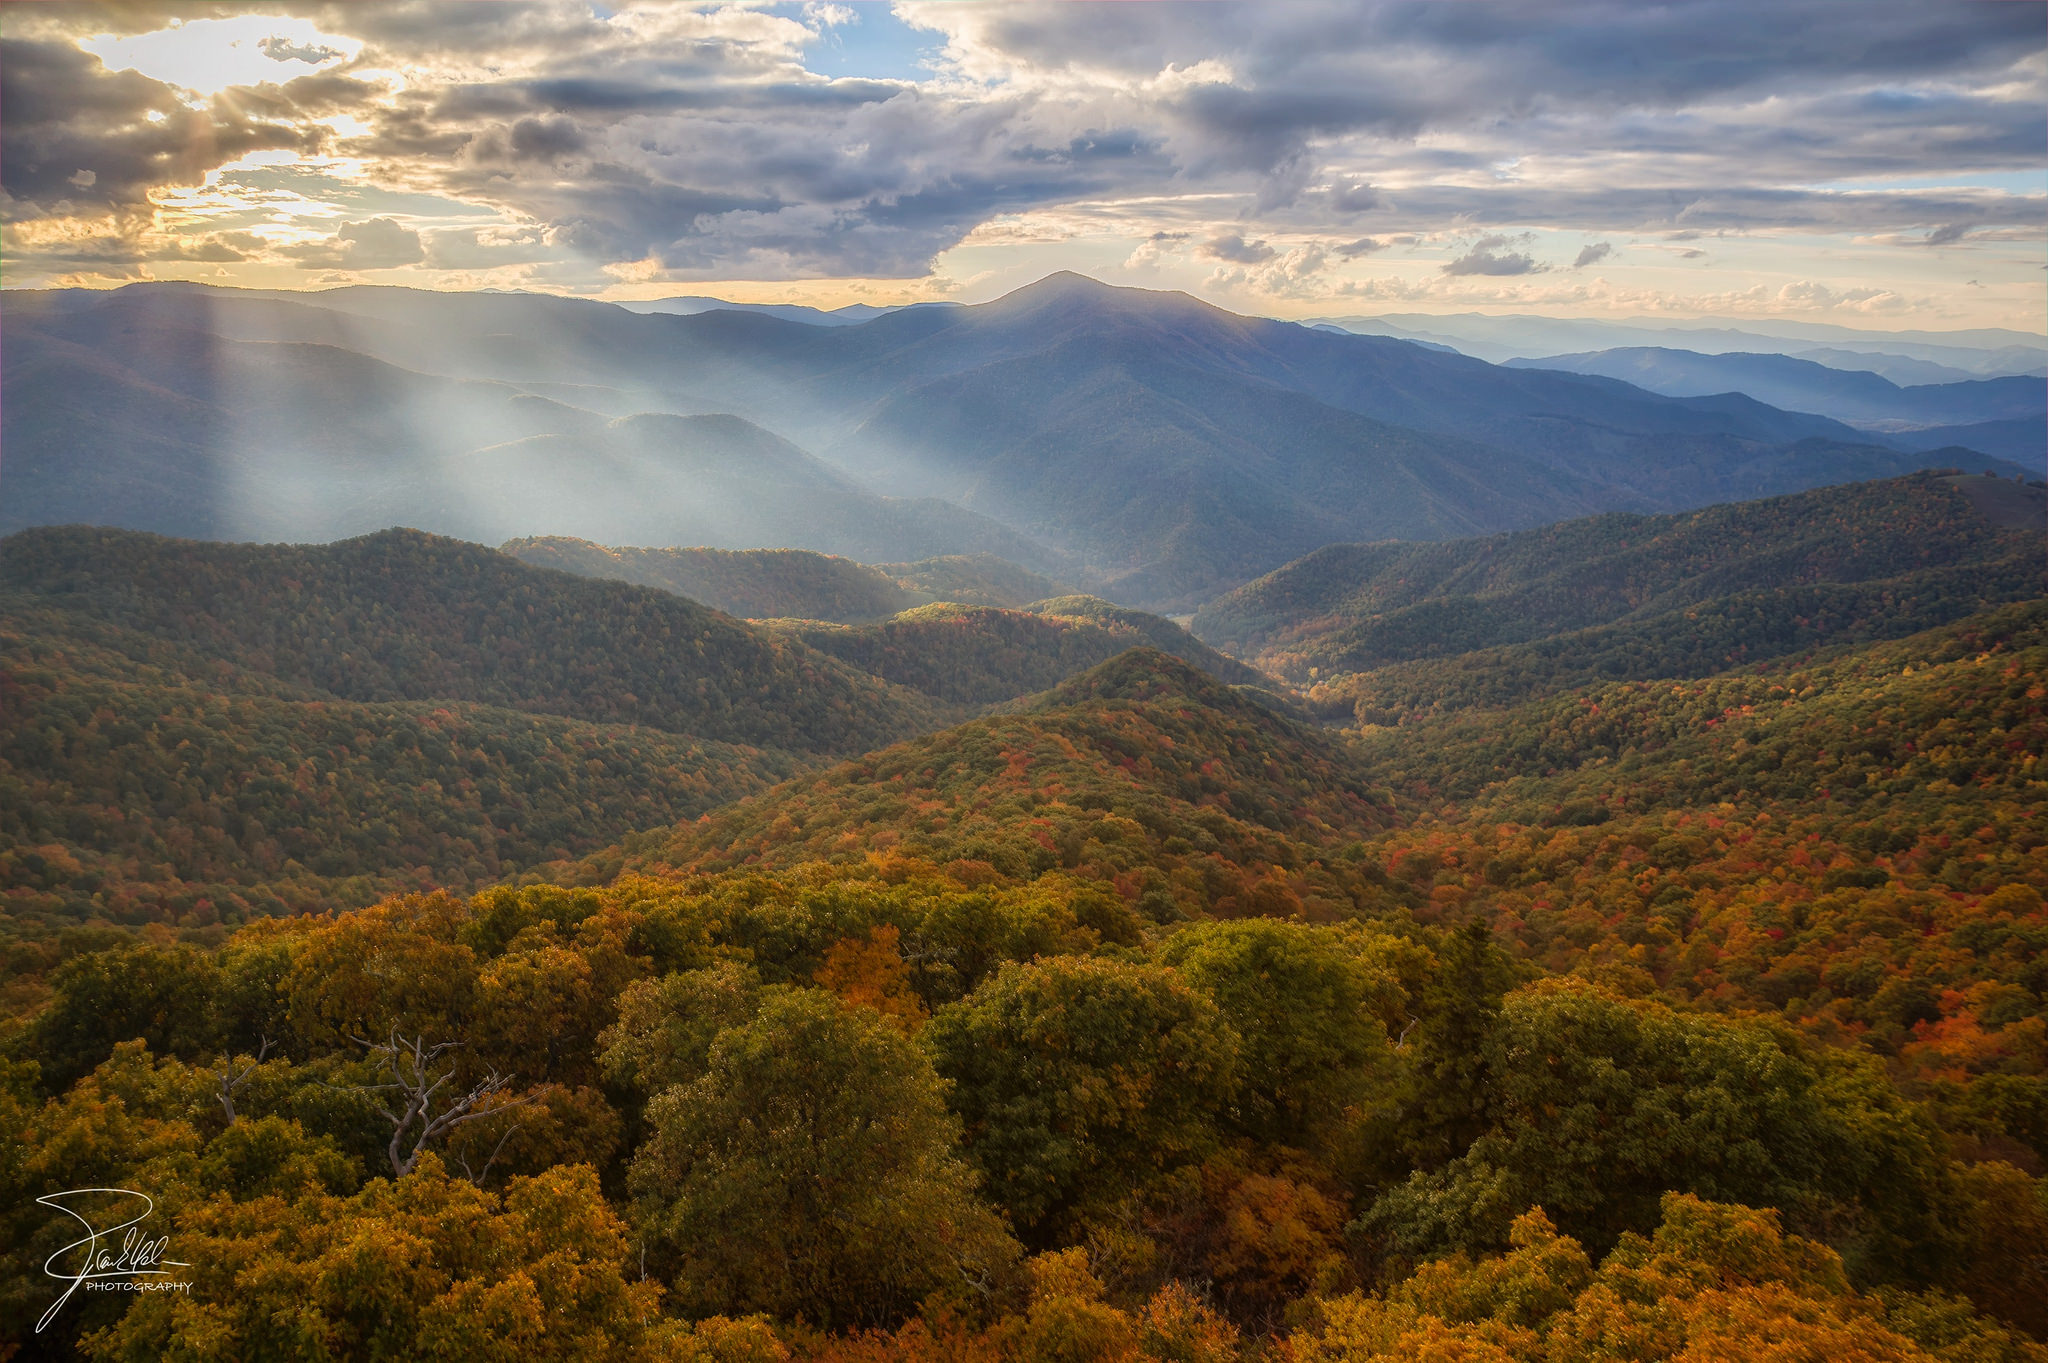 Hike To Fryingpan Mountain Lookout Tower North Carolina